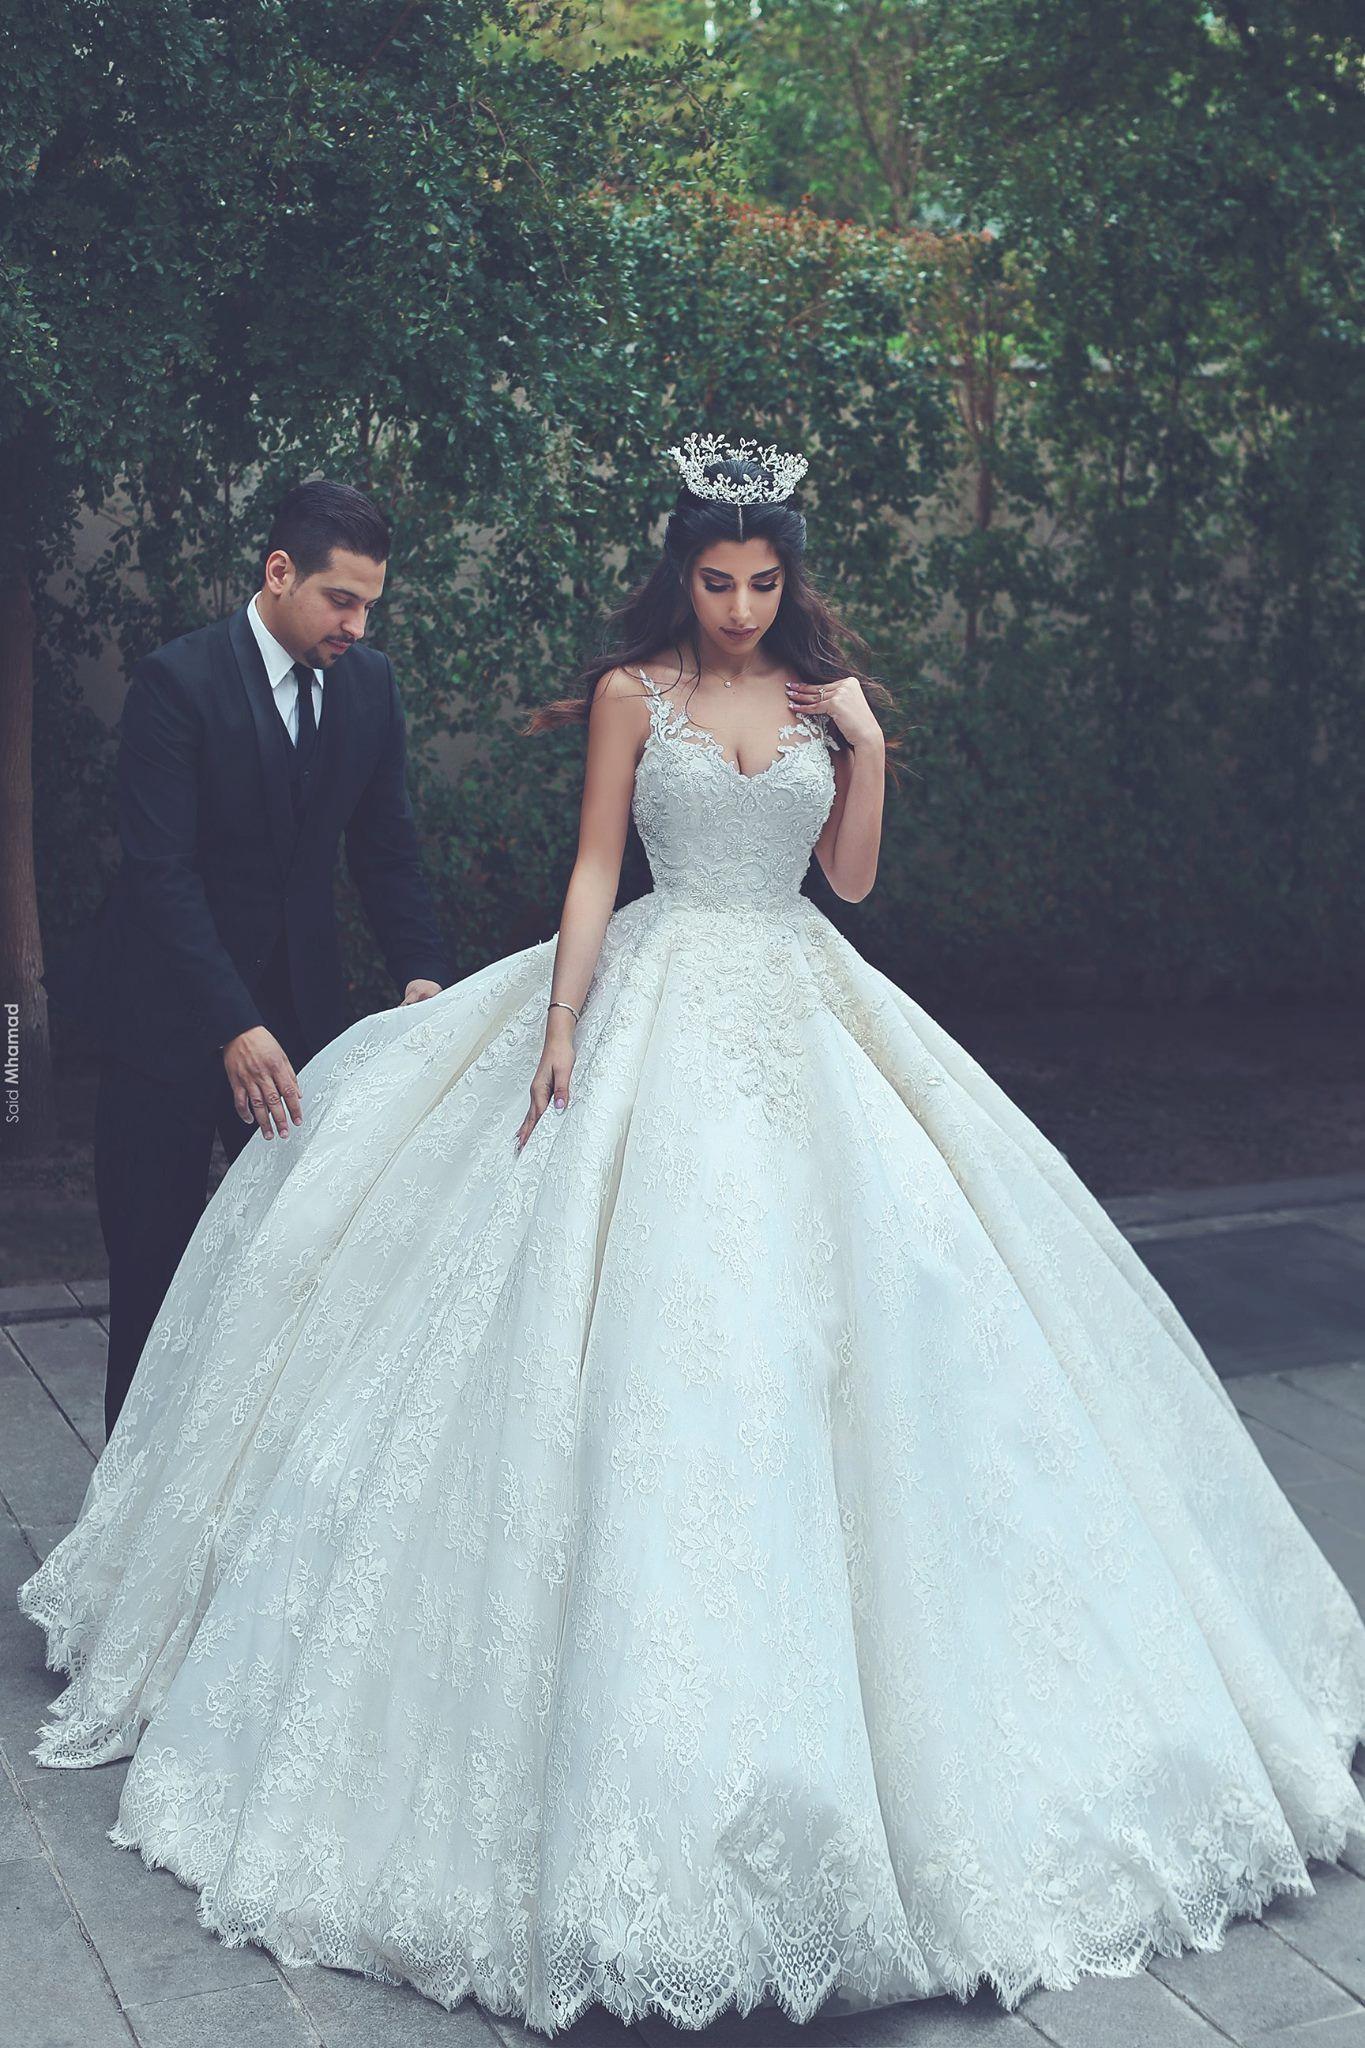 Nice wedding dresses  Pin by Merve Gulcer on Prinsess wedding dresses  Pinterest  Nice